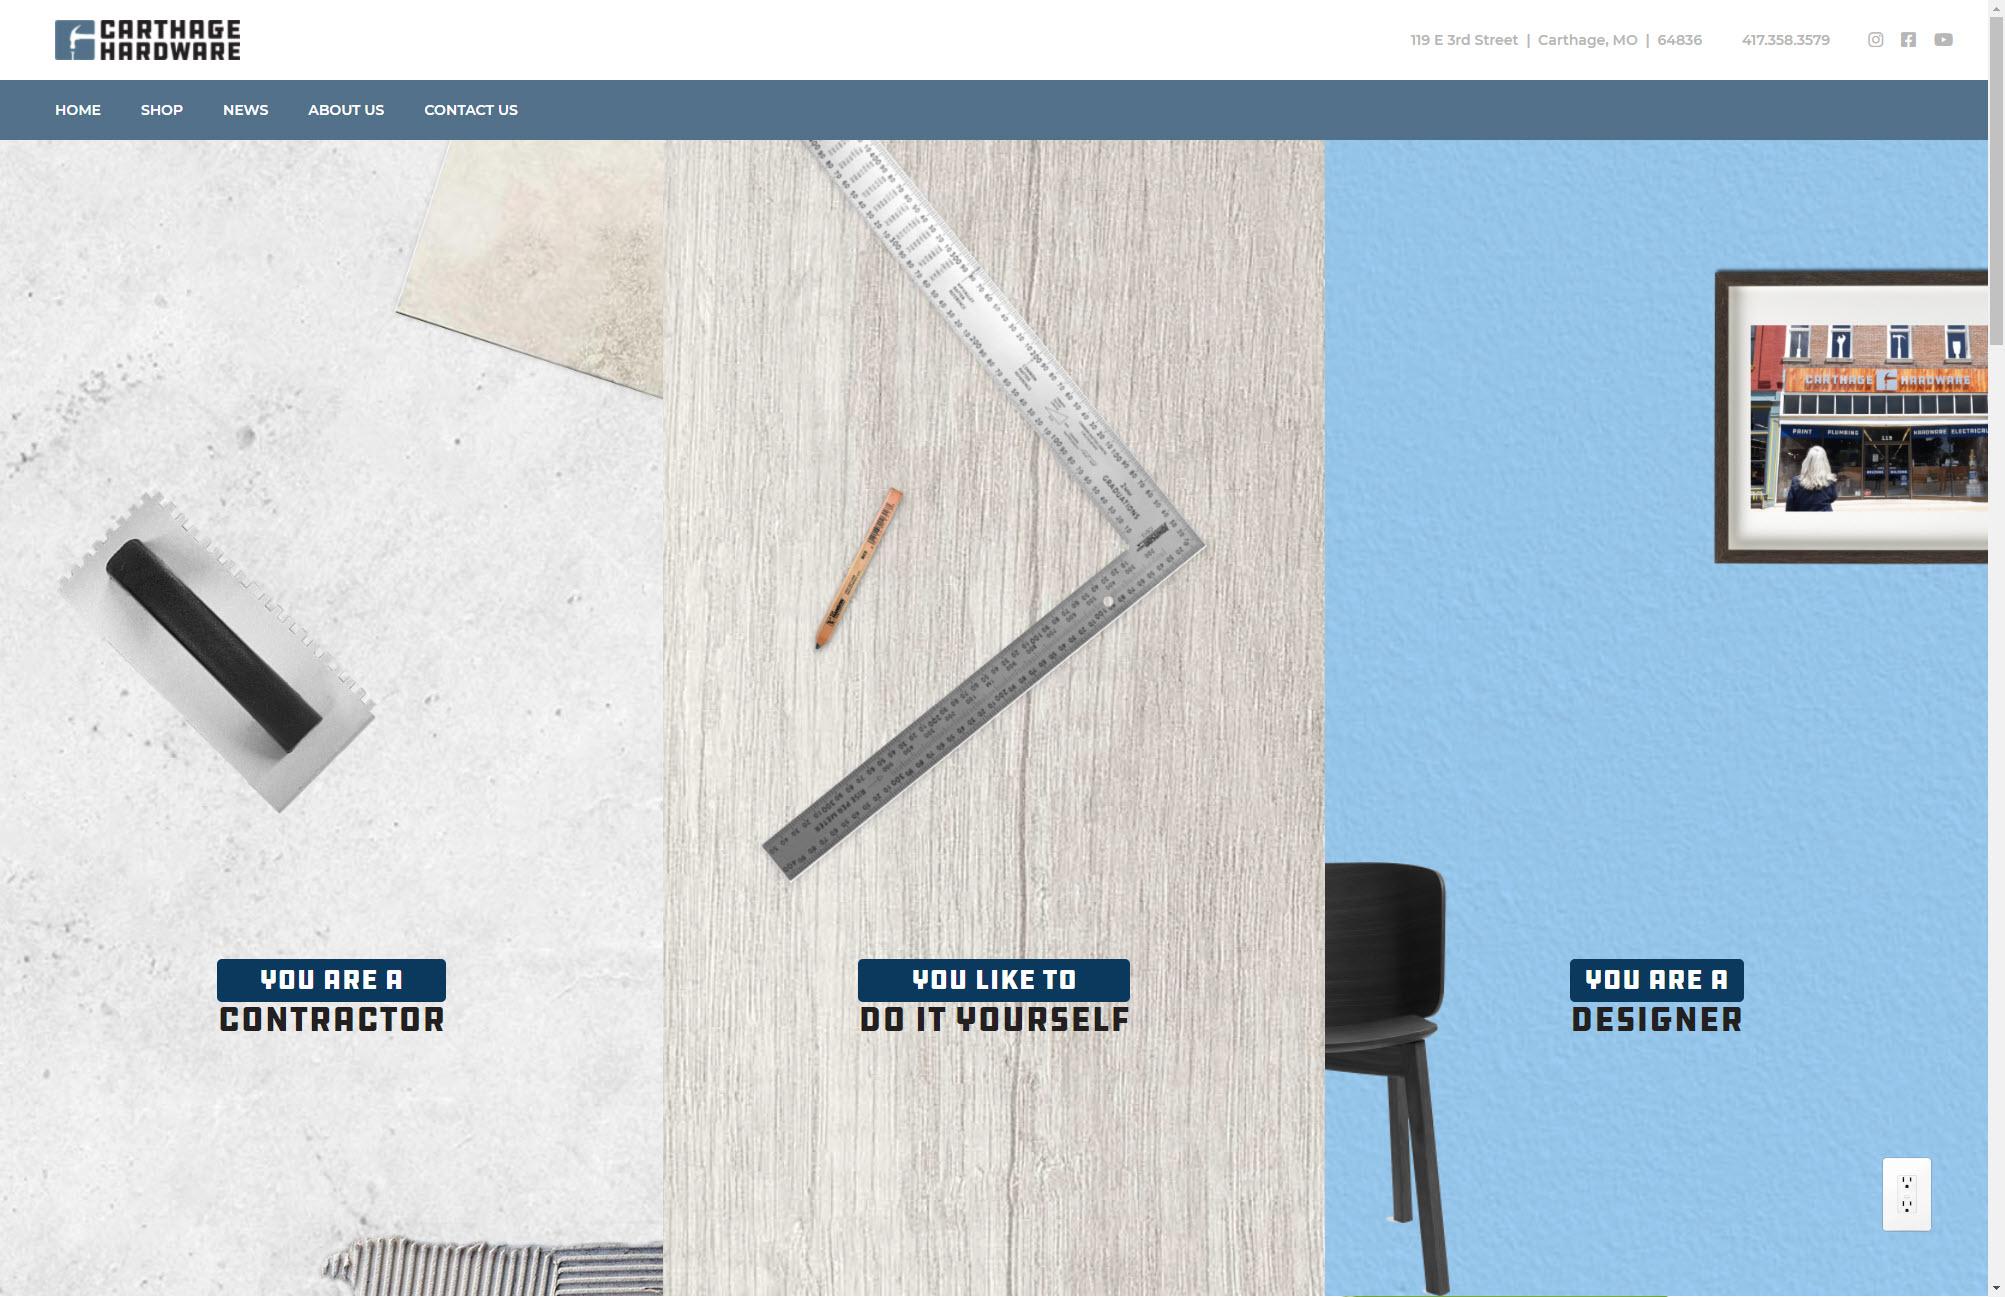 Carthage Hardware Homepage Web Design Joplin Mo